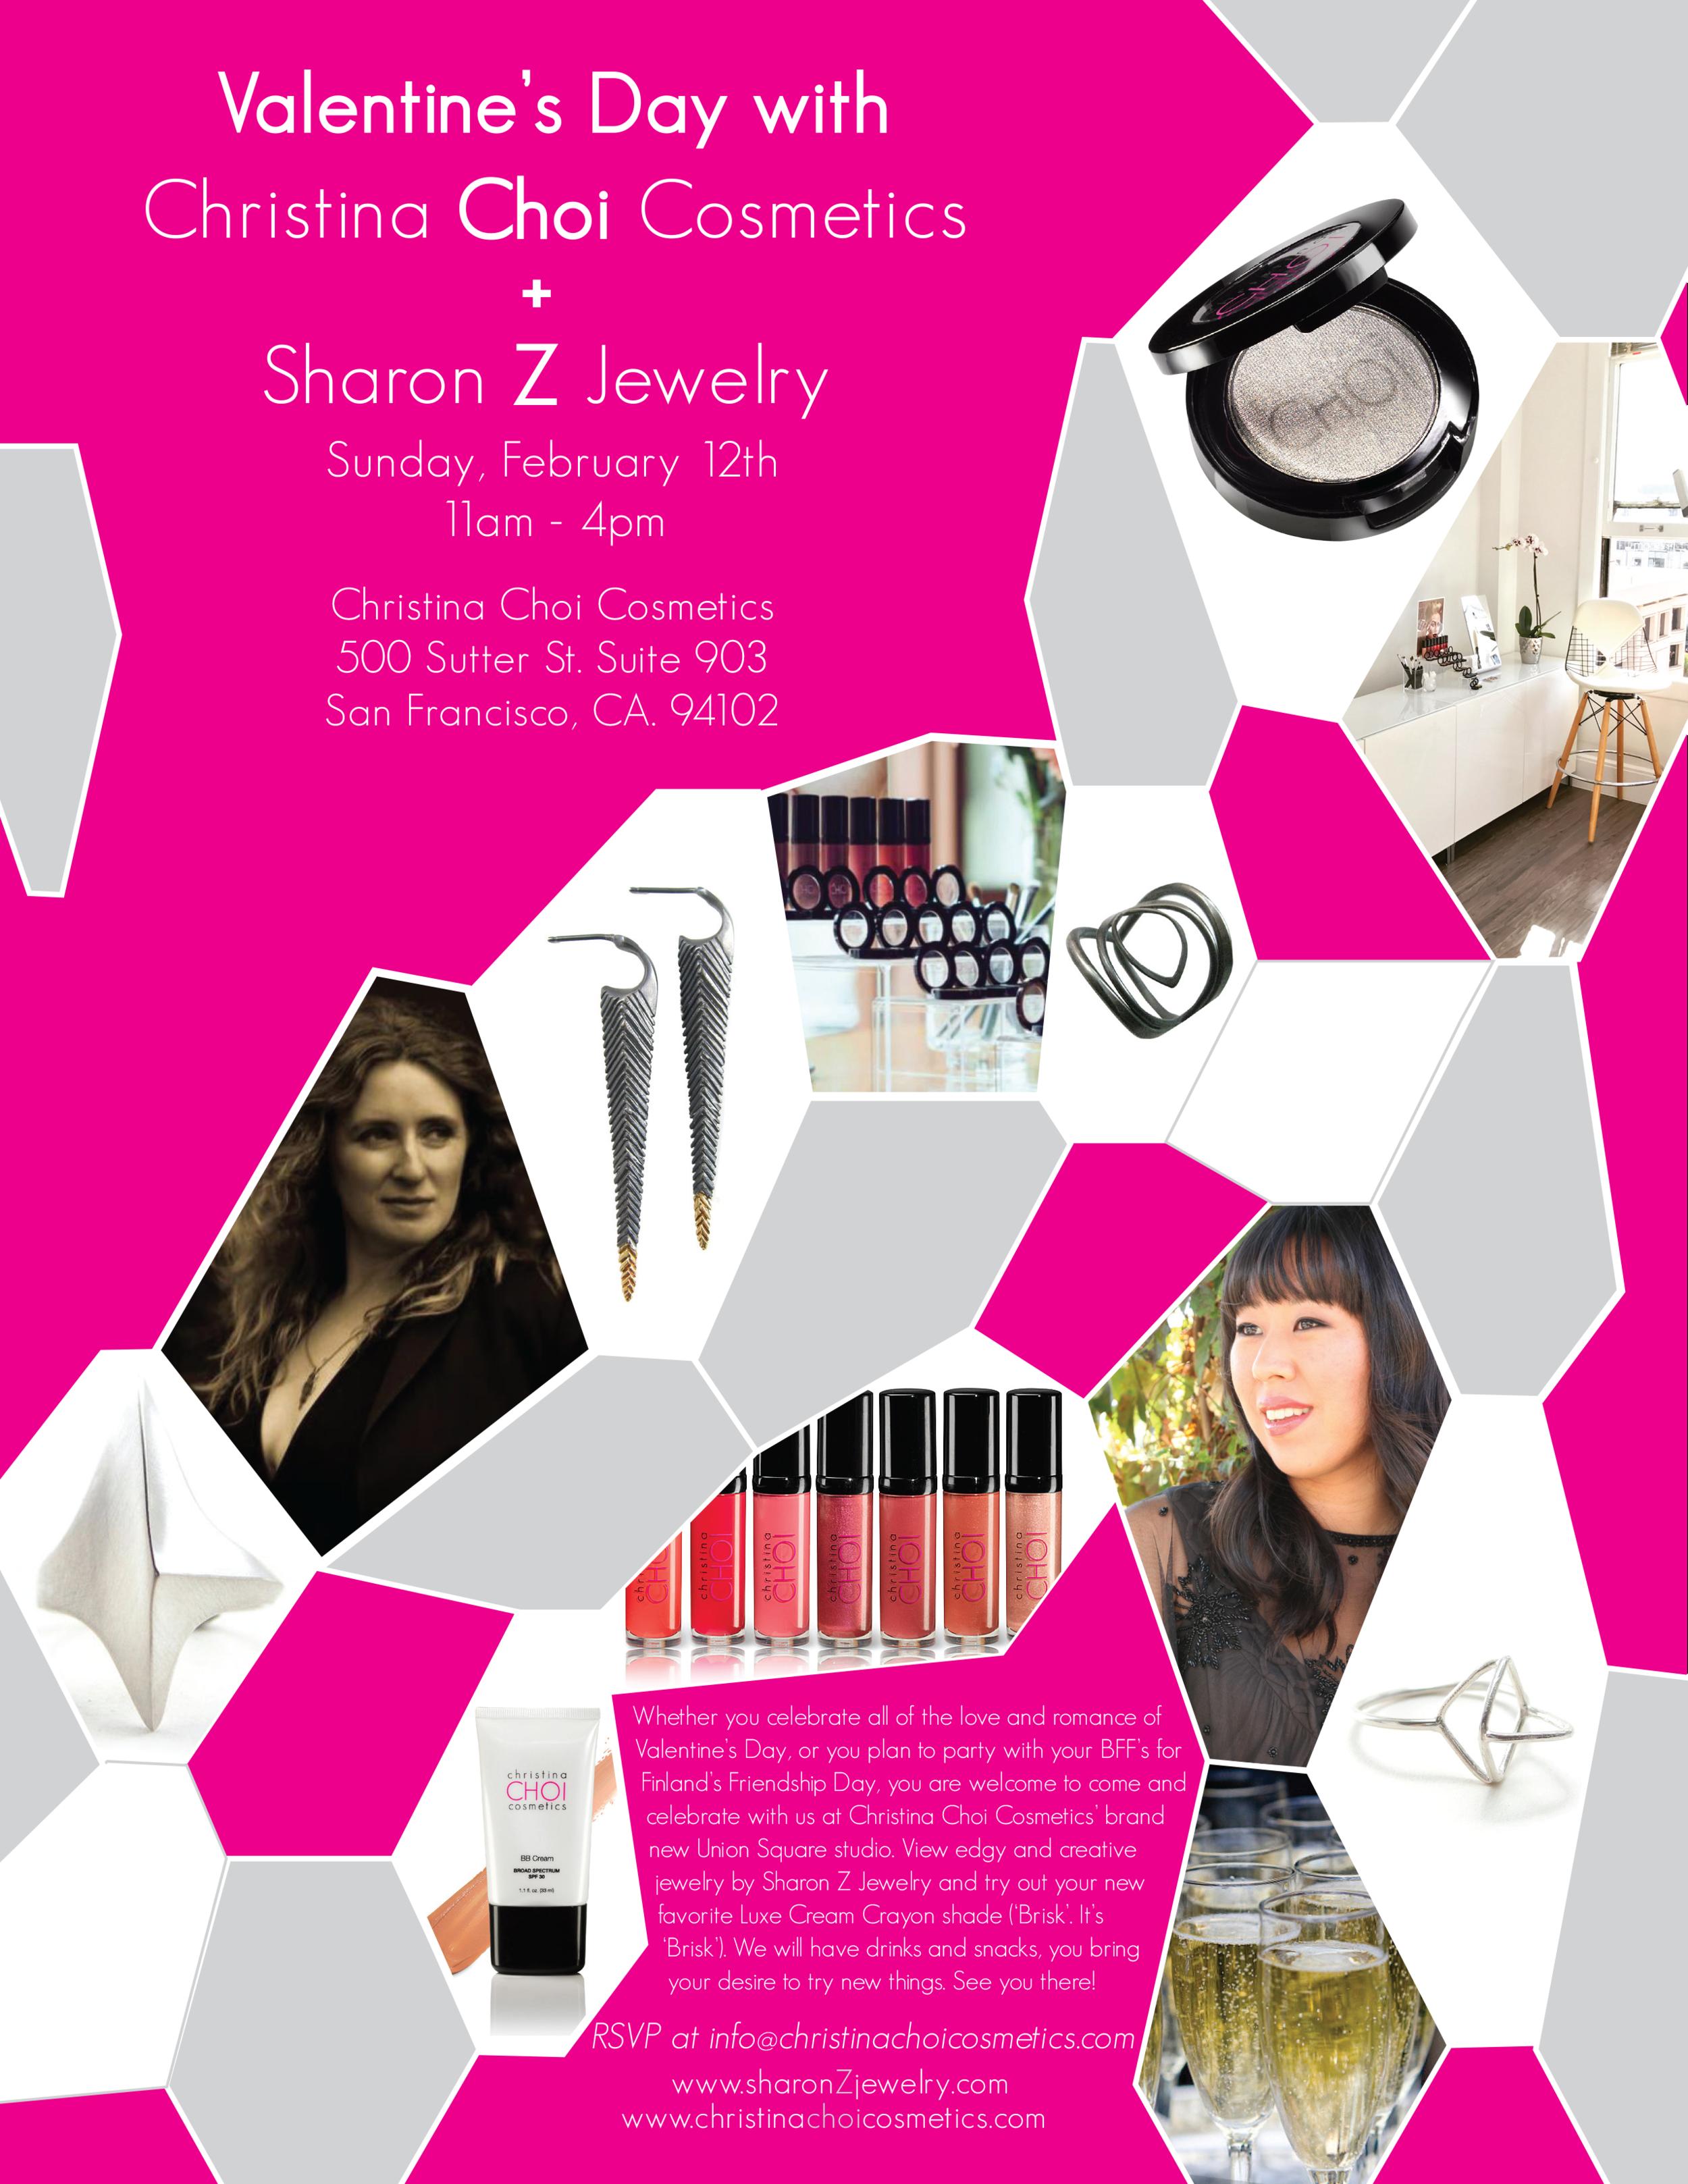 Valentine's Day at Christina Choi Cosmetics with Sharon Z Jewelry